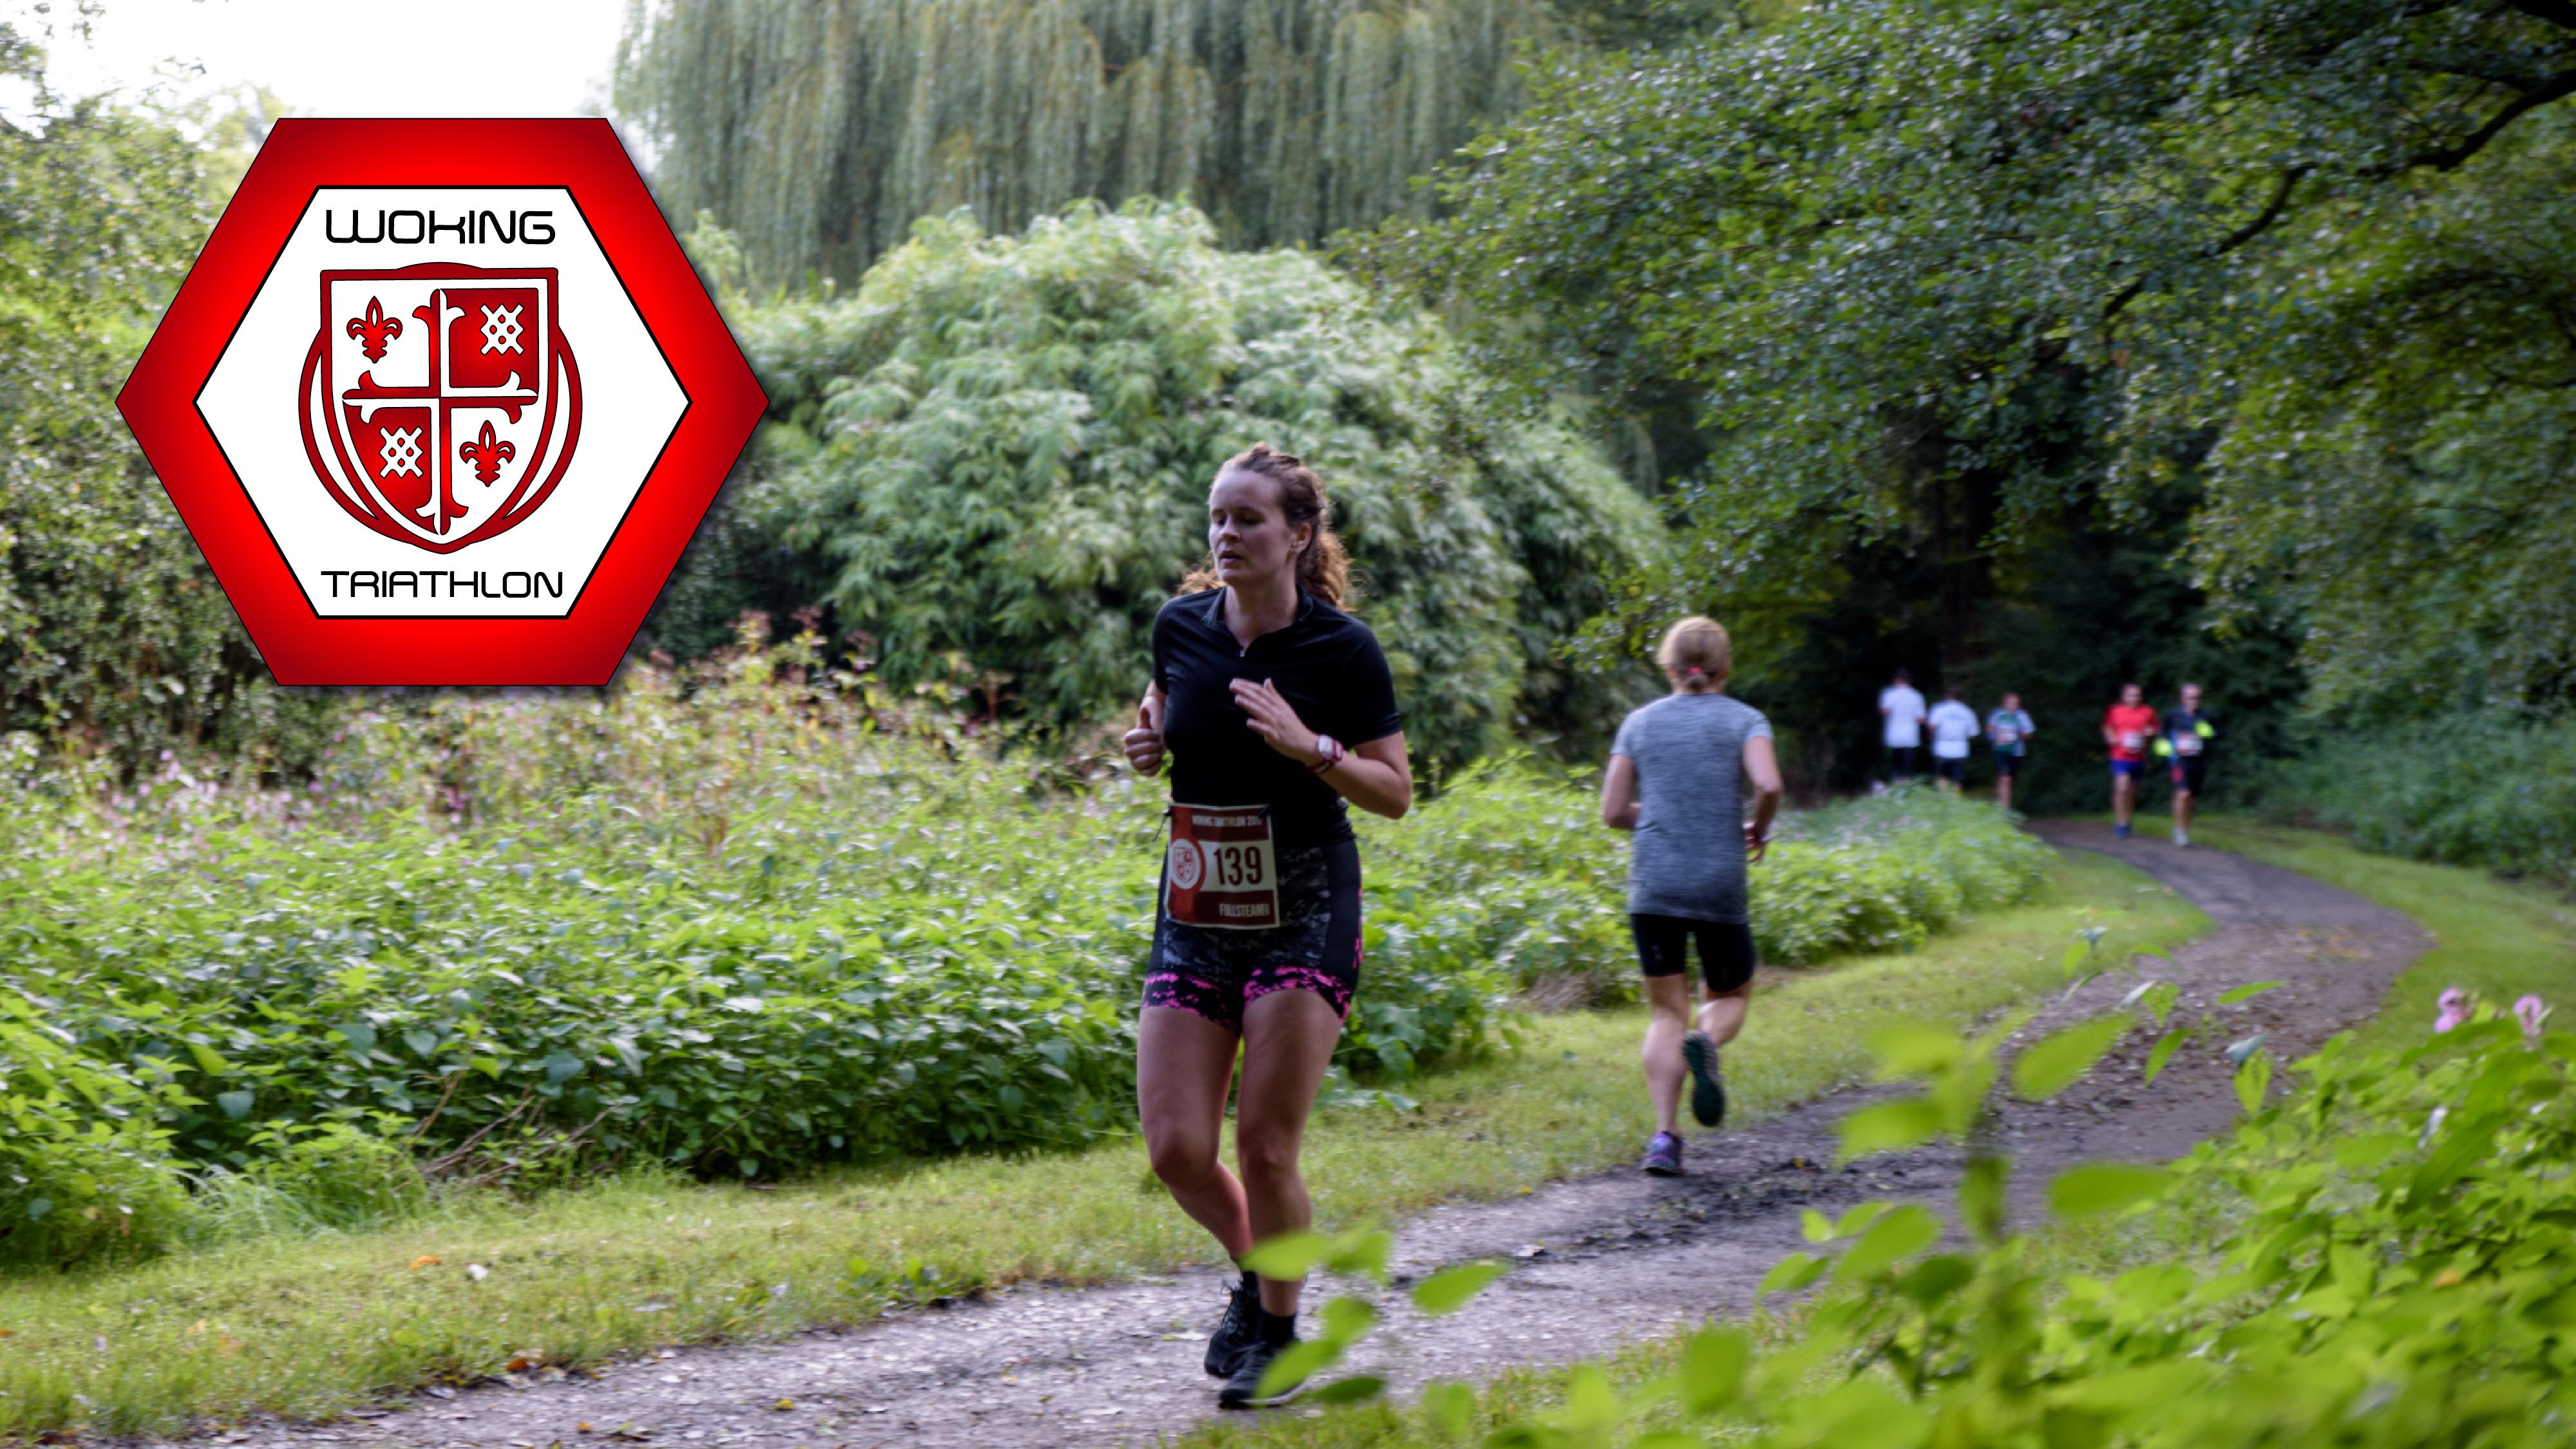 Woking Triathlon - cover image